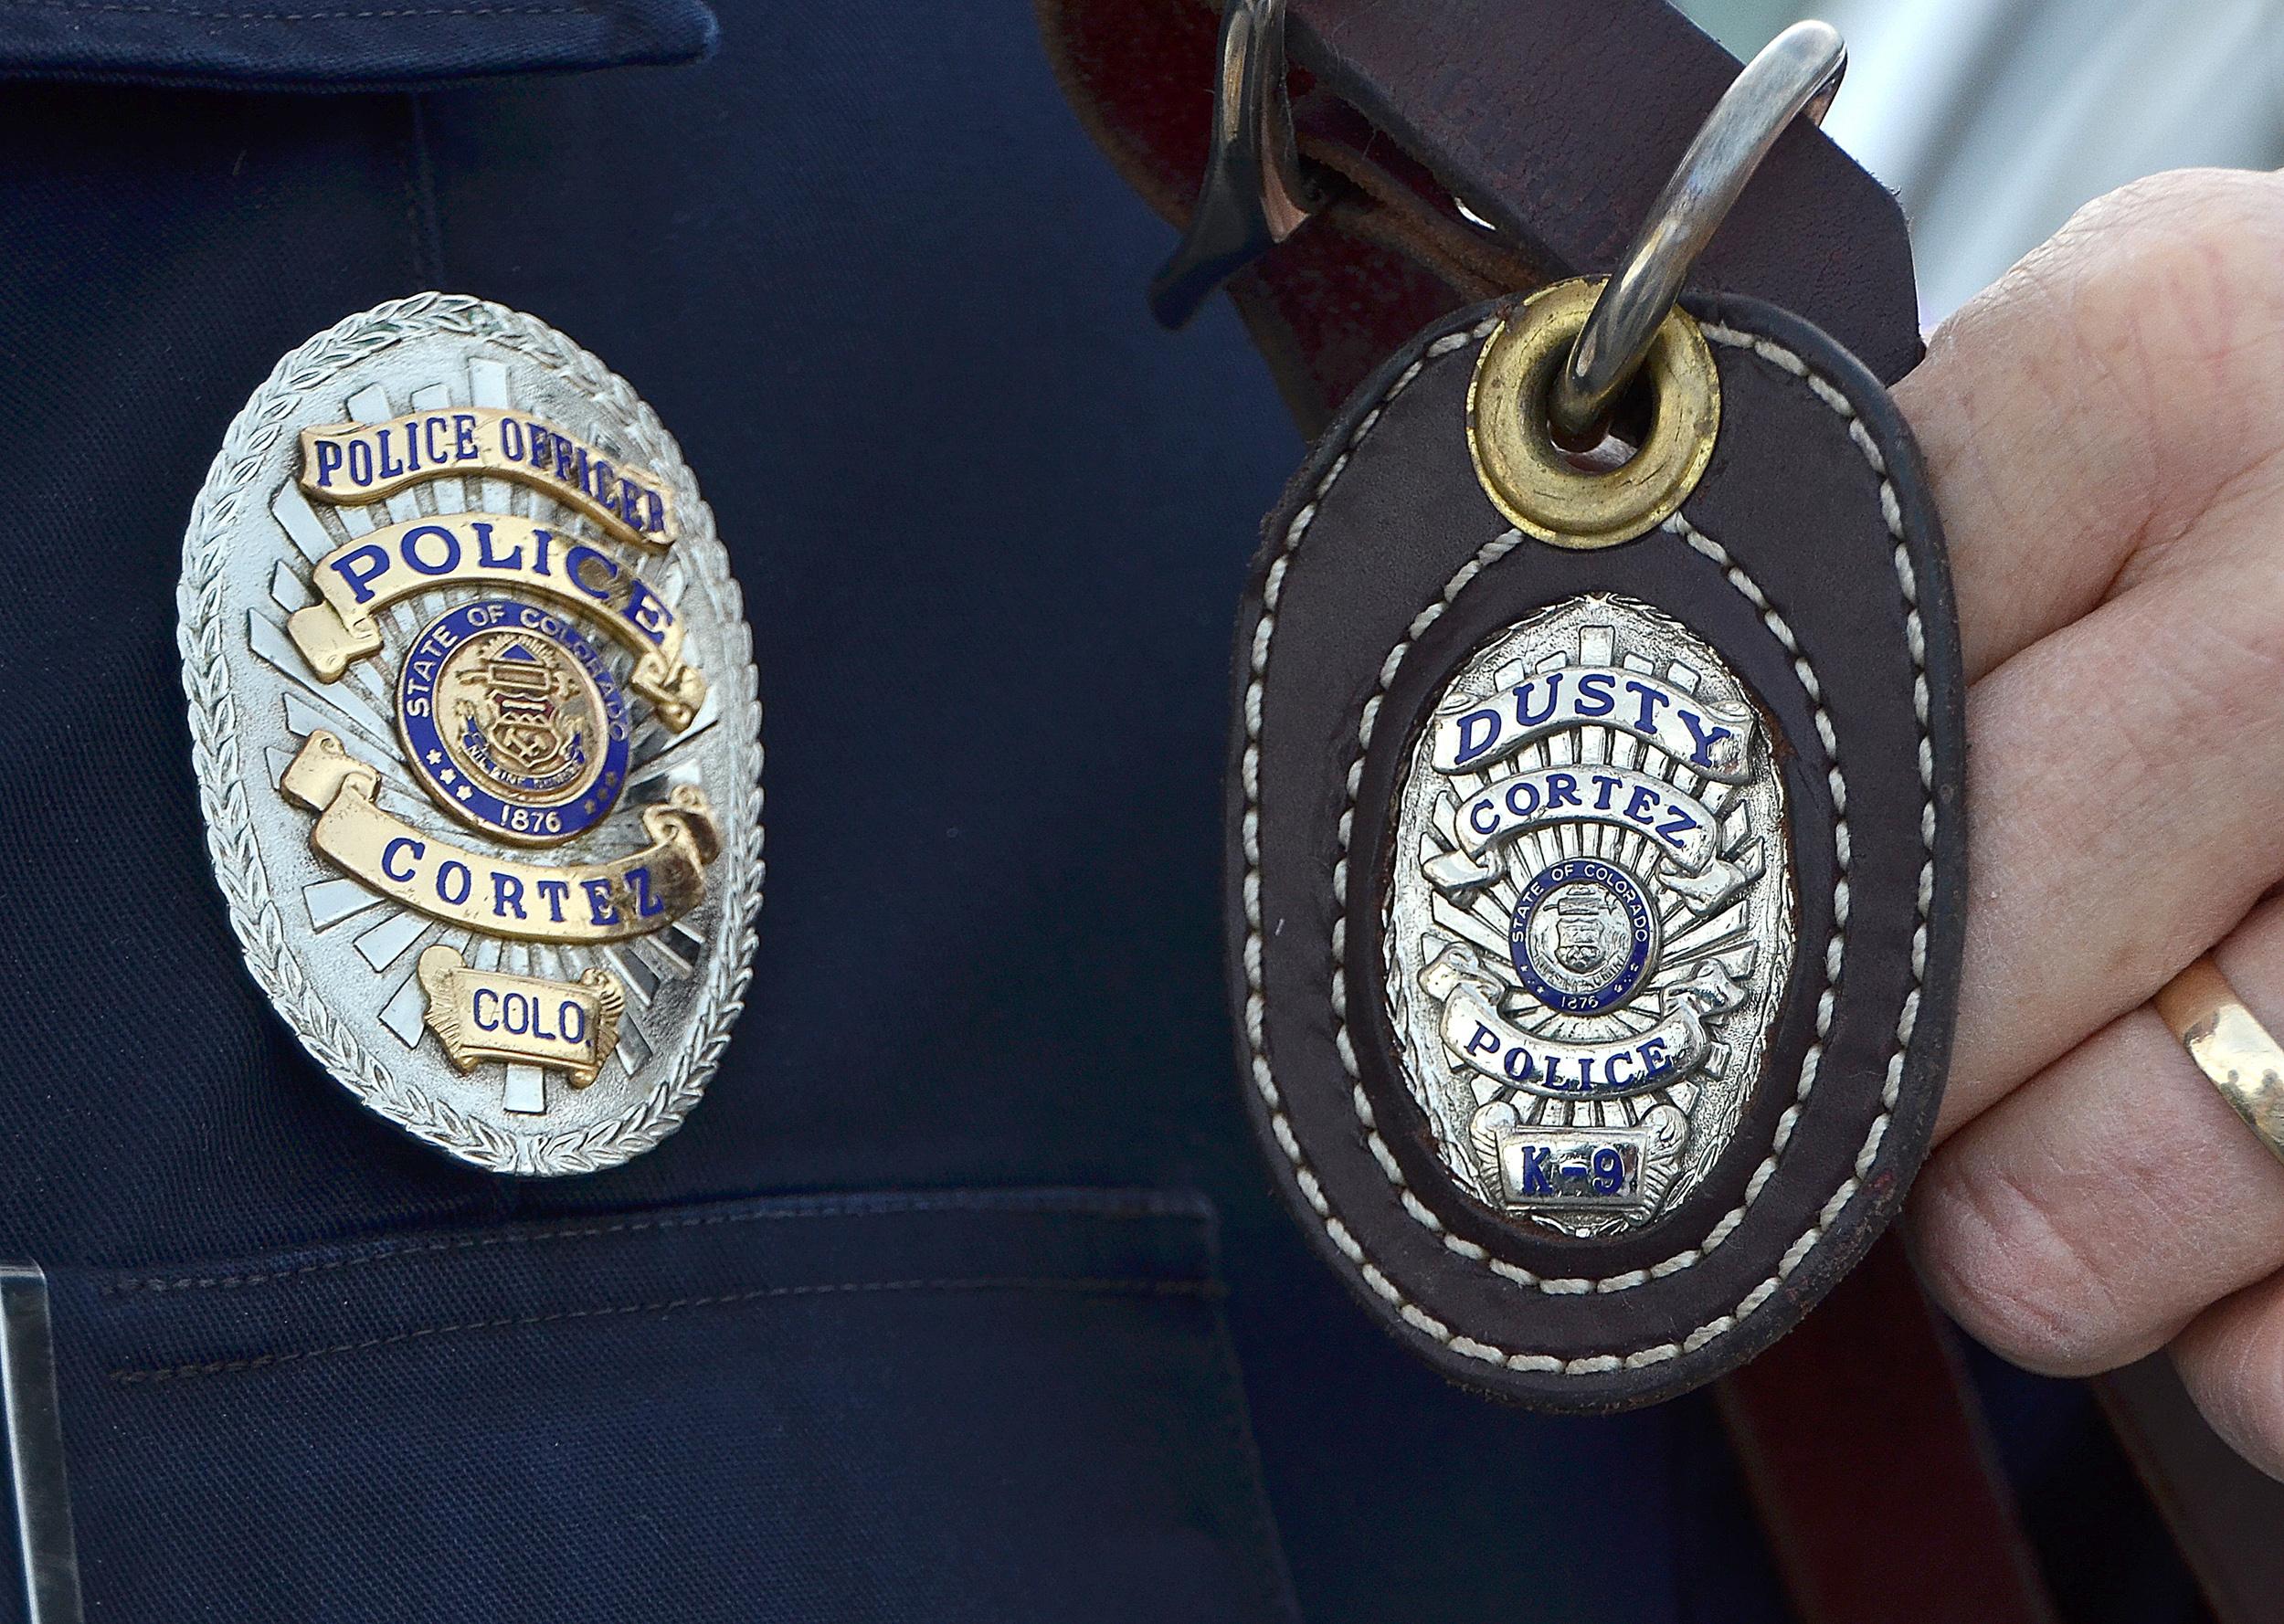 Police k9, War dogs